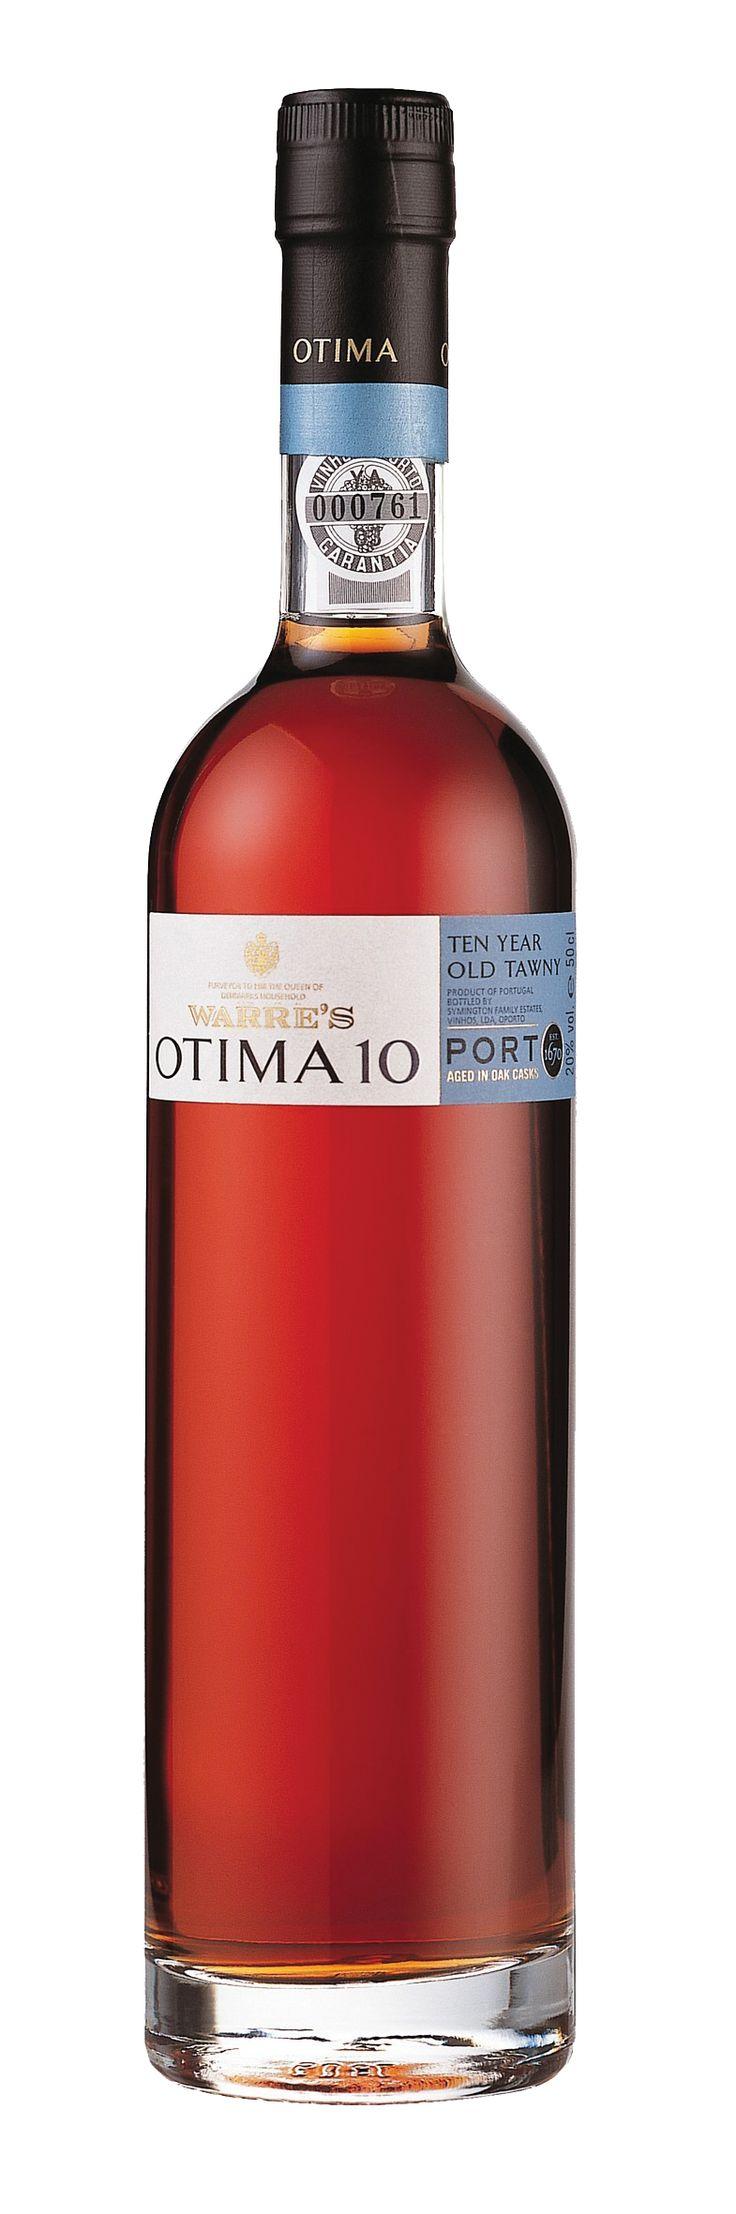 California Wine of the Week: Warre's Otima 10 Year Old Tawny Port a winter warmer